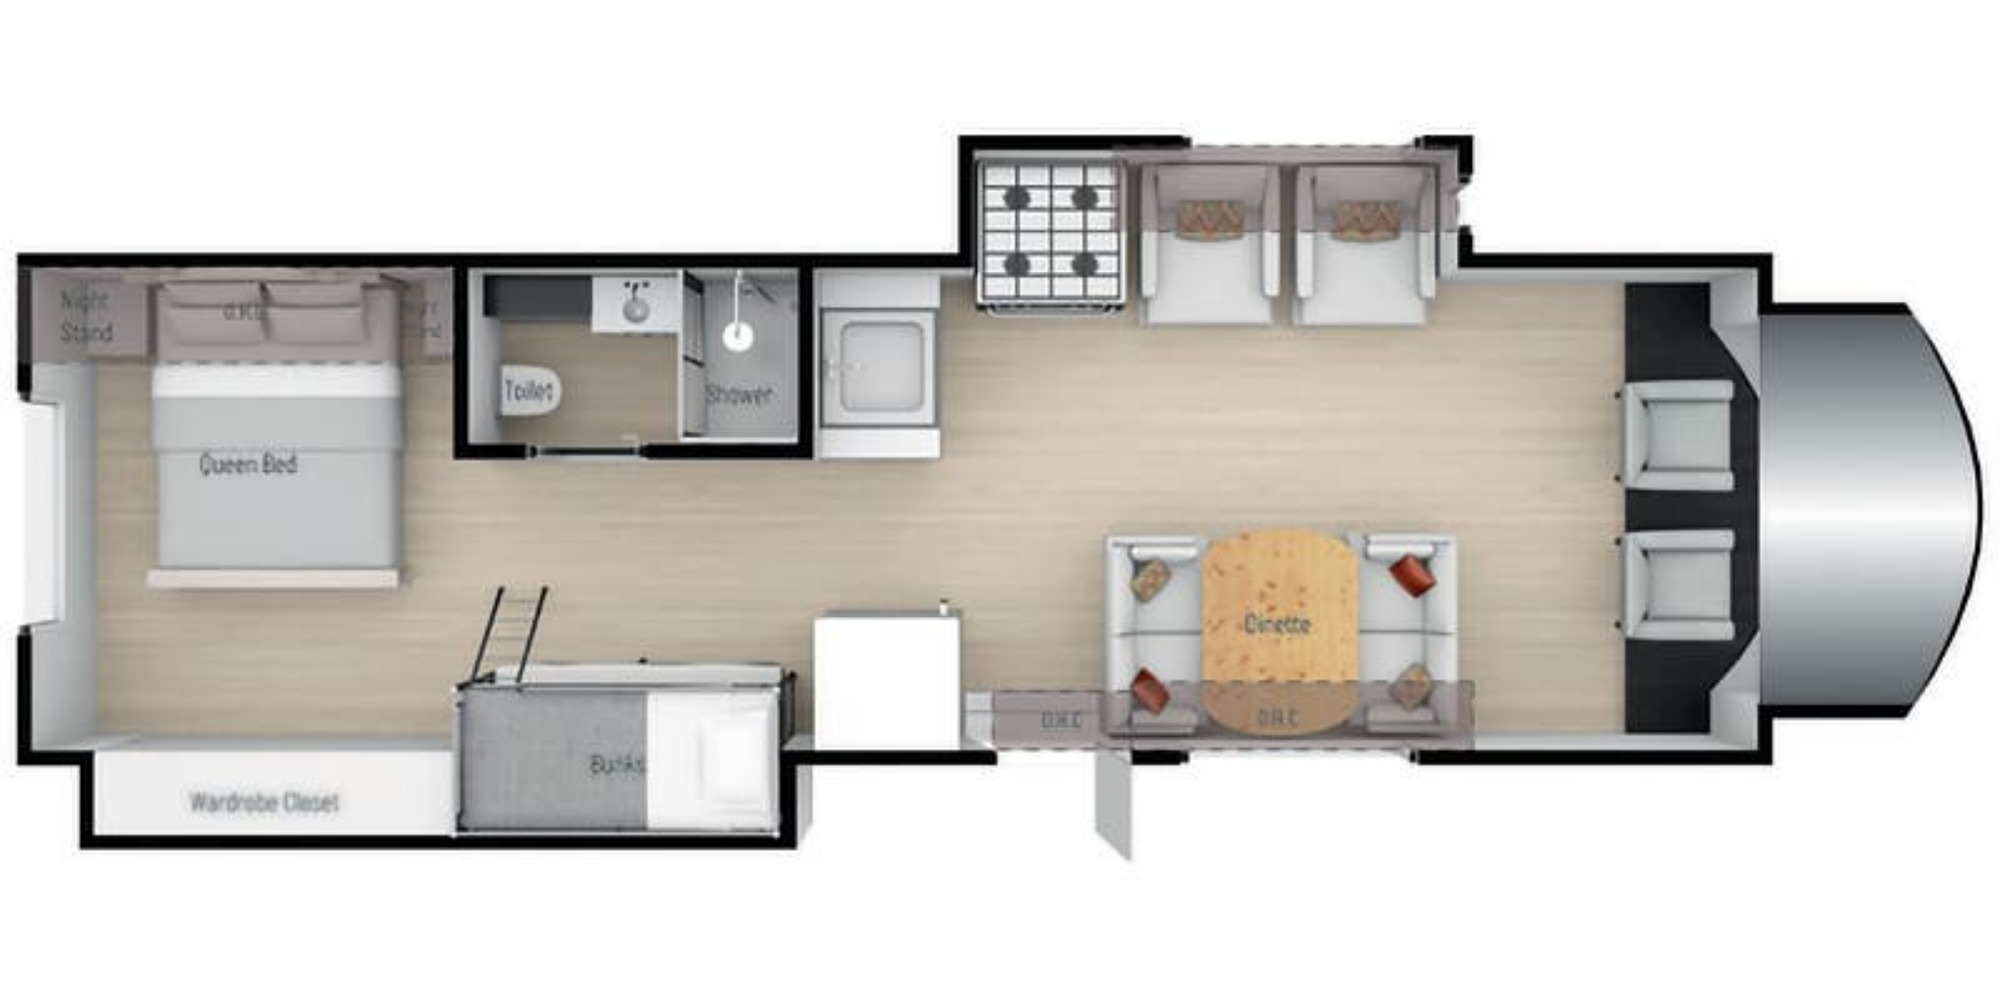 View Floor Plan for 2021 NEXUS RV TRIUMPH 32T